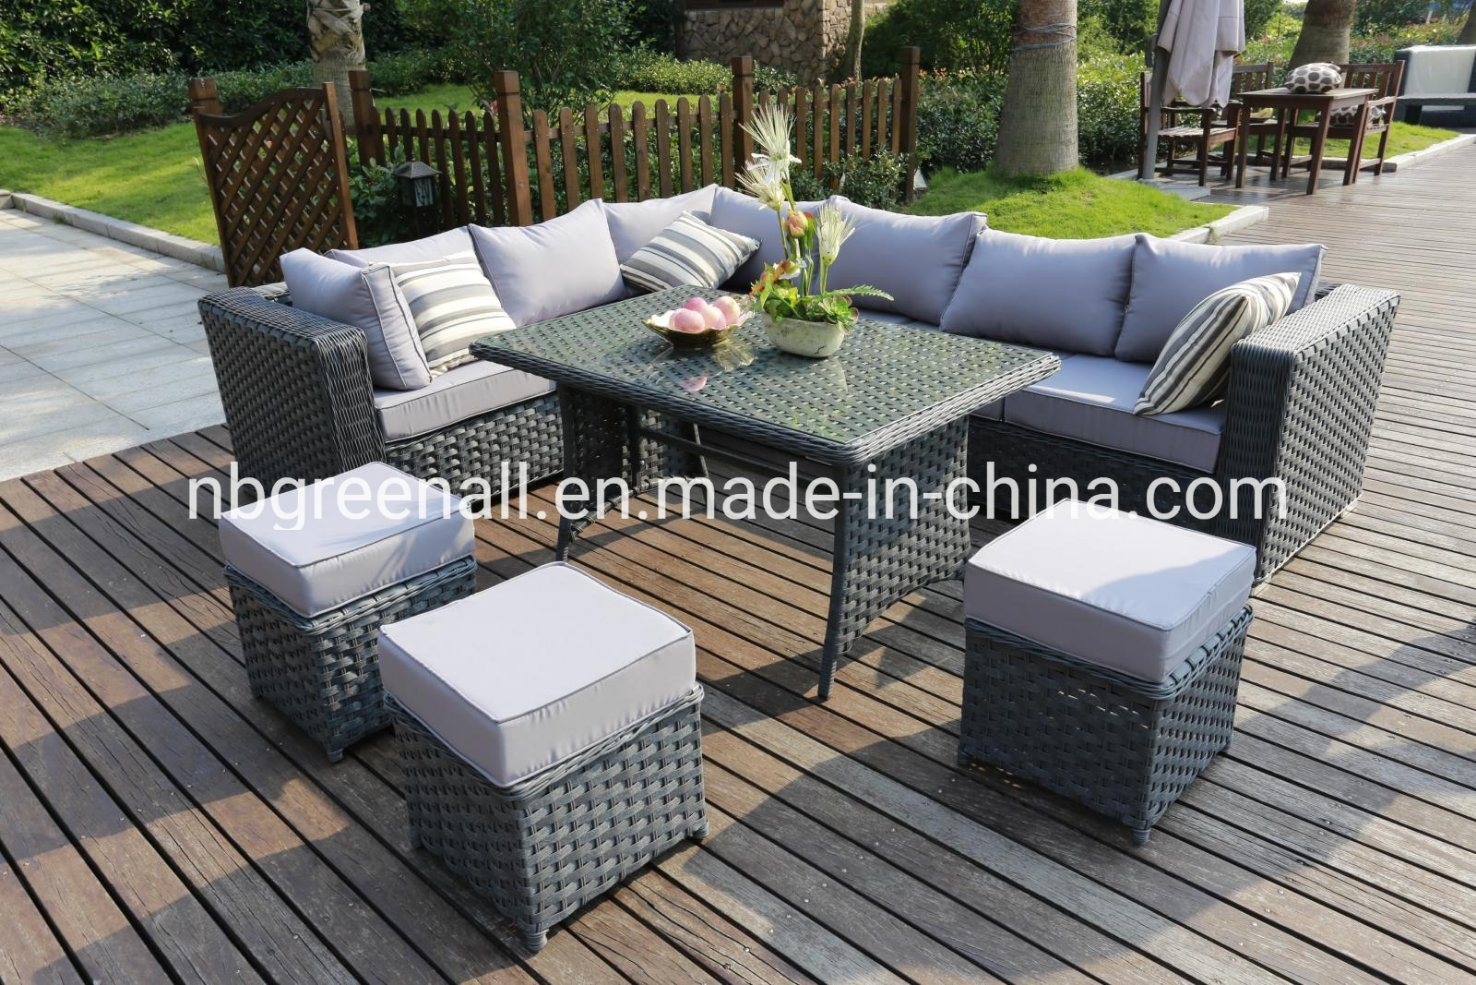 Mix Modern Outdoor Rattan Wicker Sofa